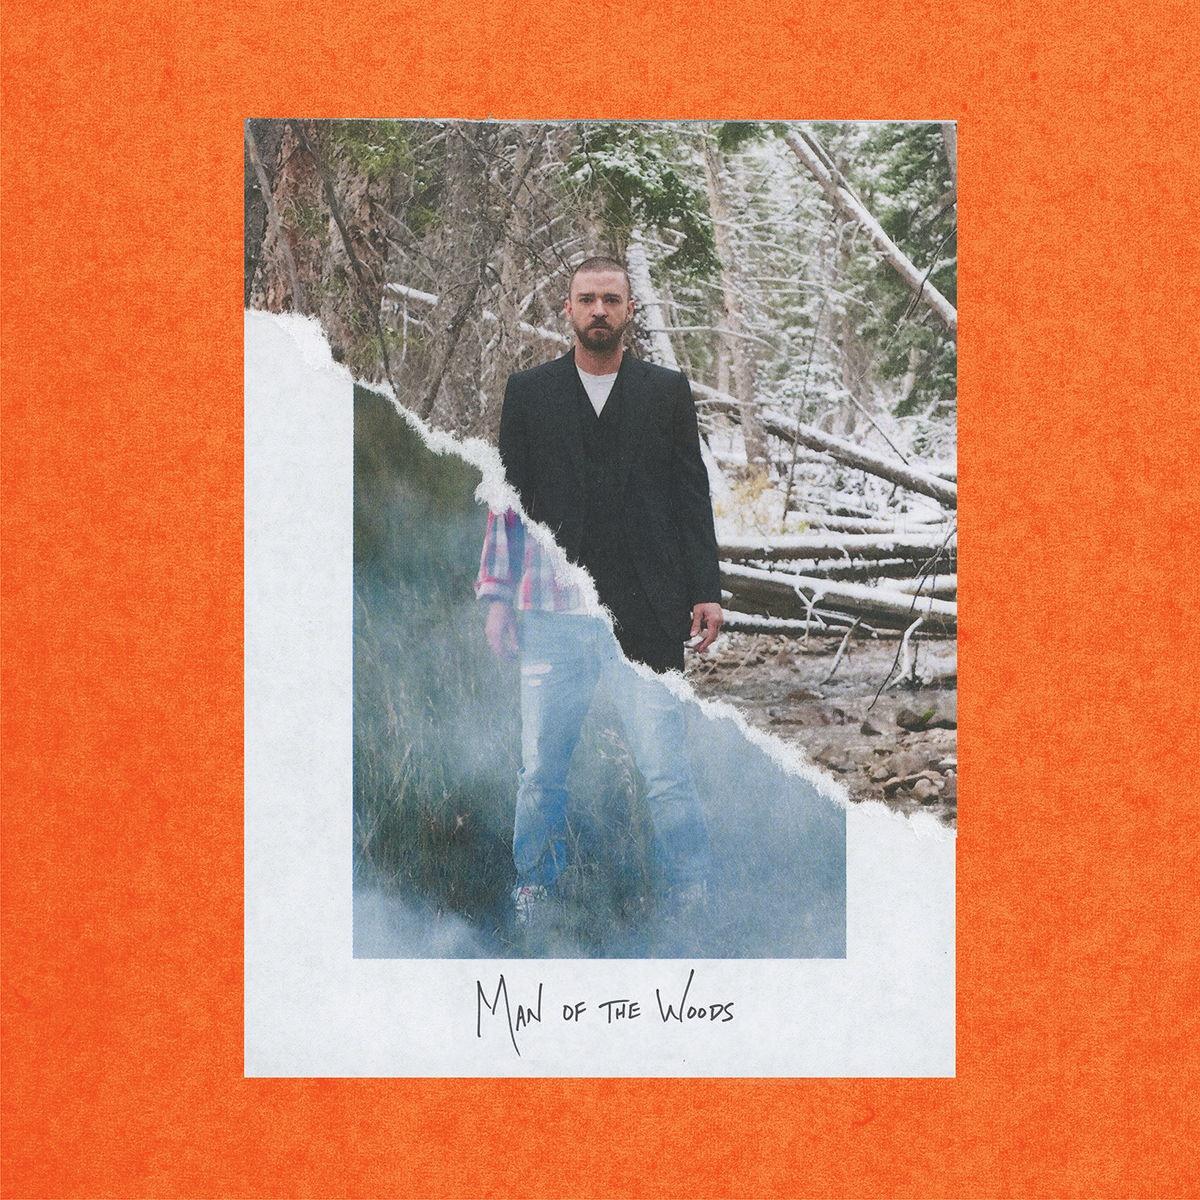 justin_timberlake-man_of_the_woods_s.jpg